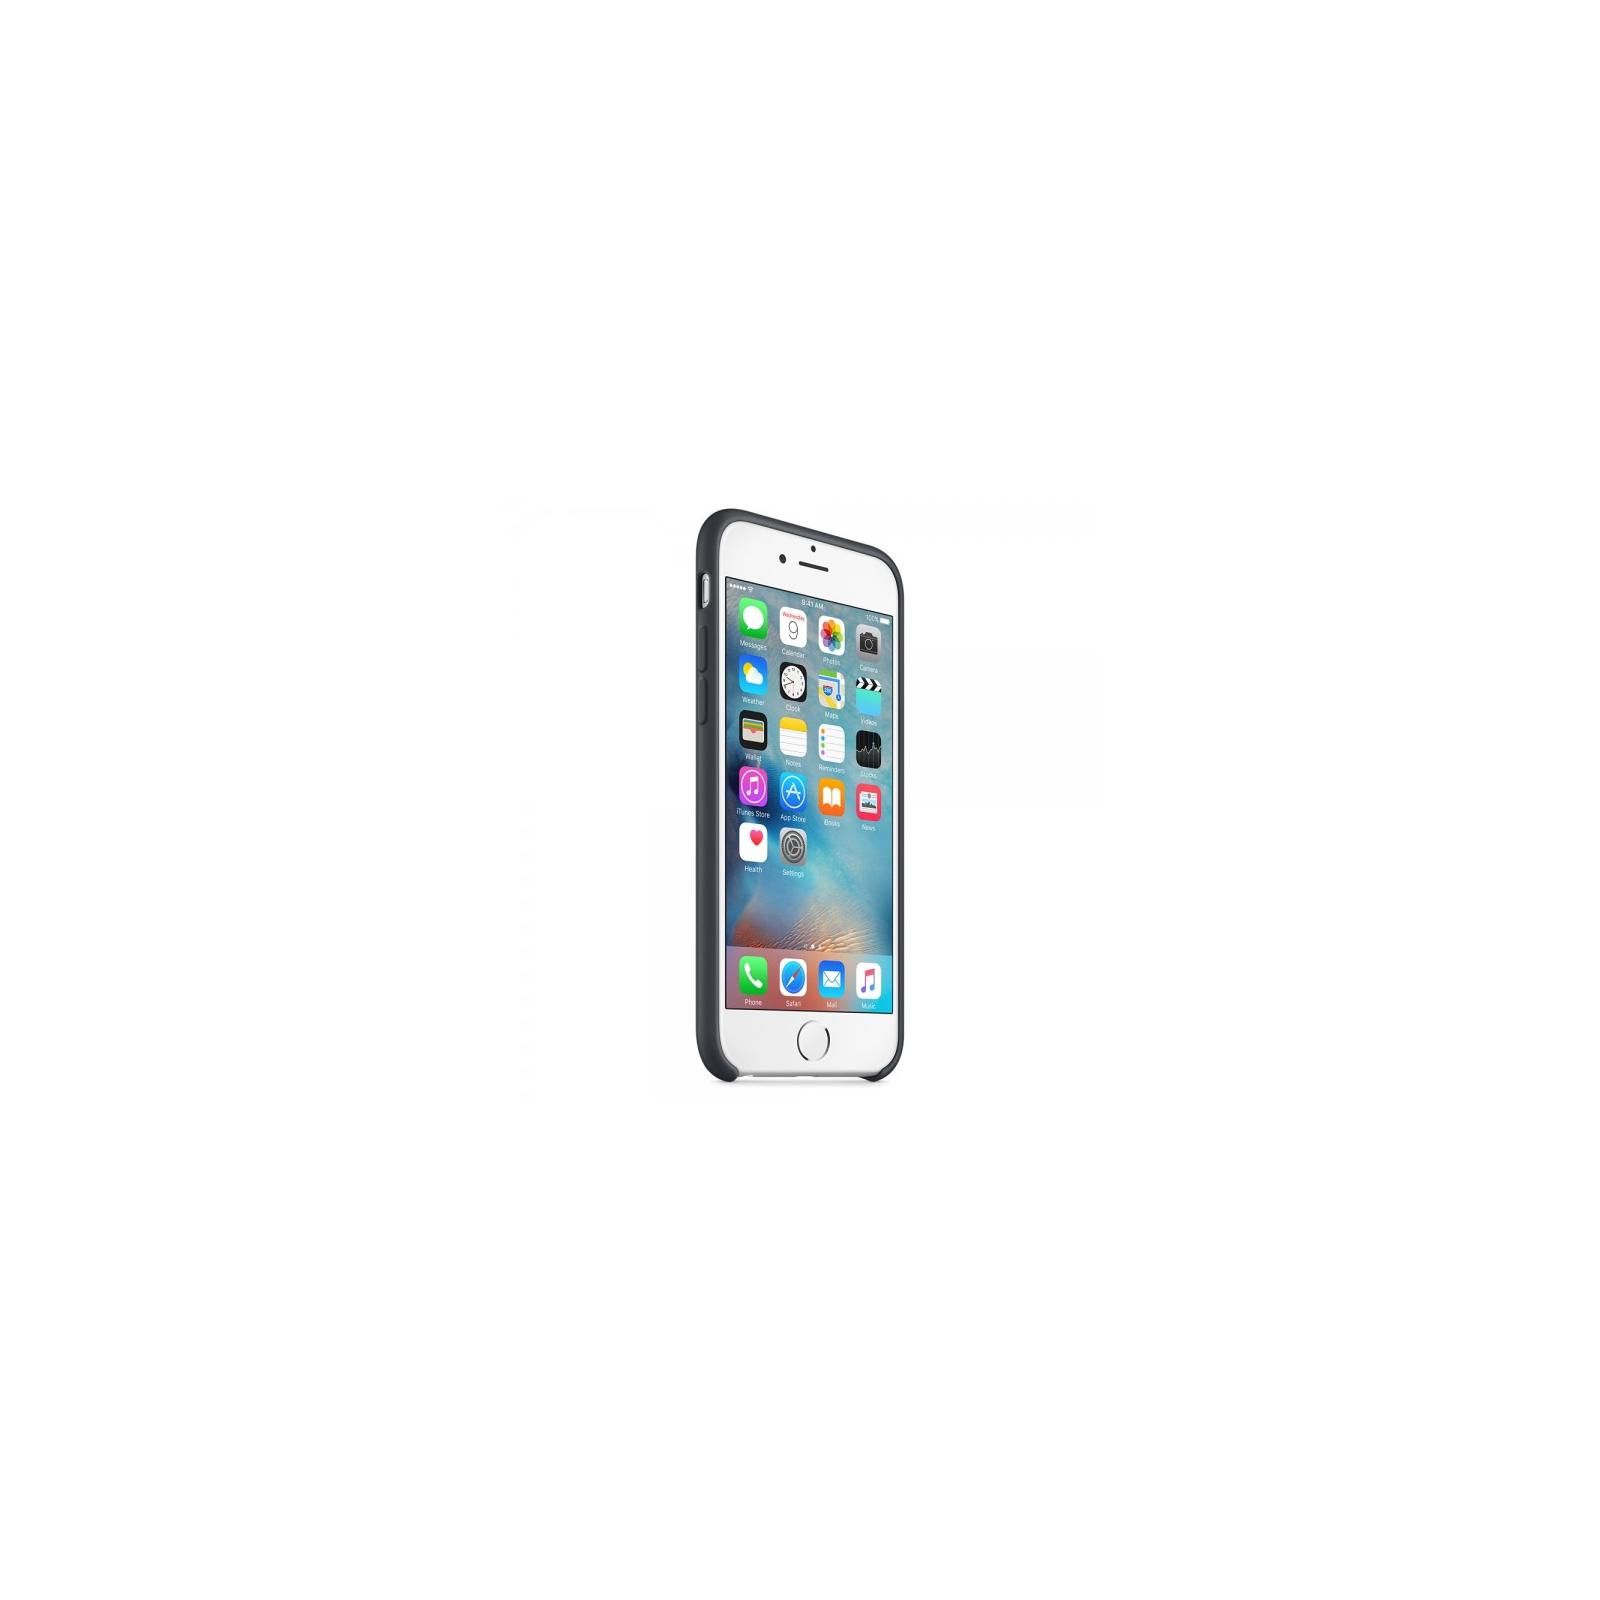 Чехол для моб. телефона Apple для iPhone 6/6s Charcoal Gray (MKY02ZM/A) изображение 3